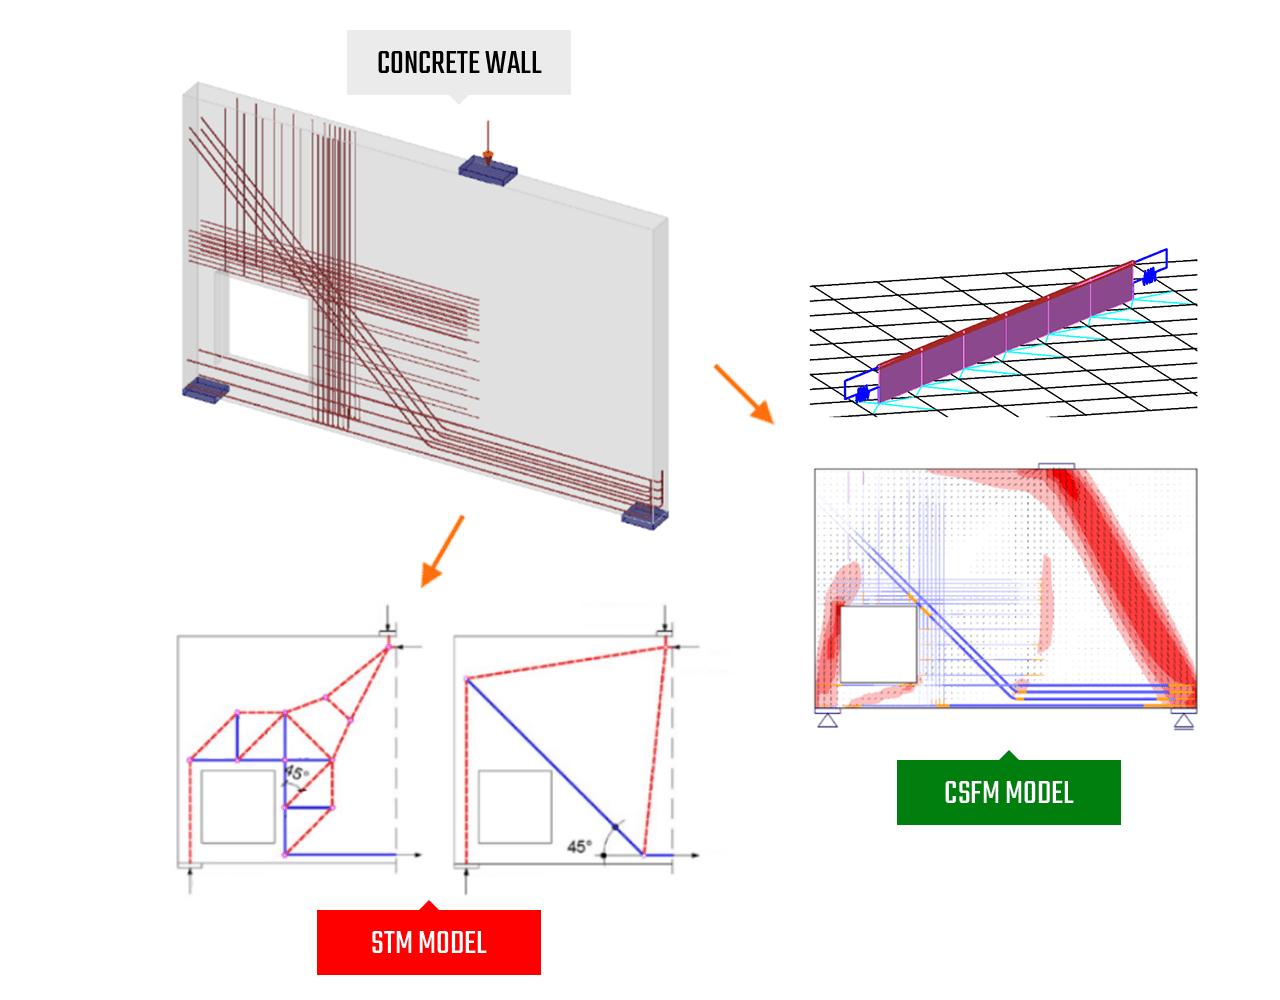 CSFM methode in IDEA StatiCa Beton